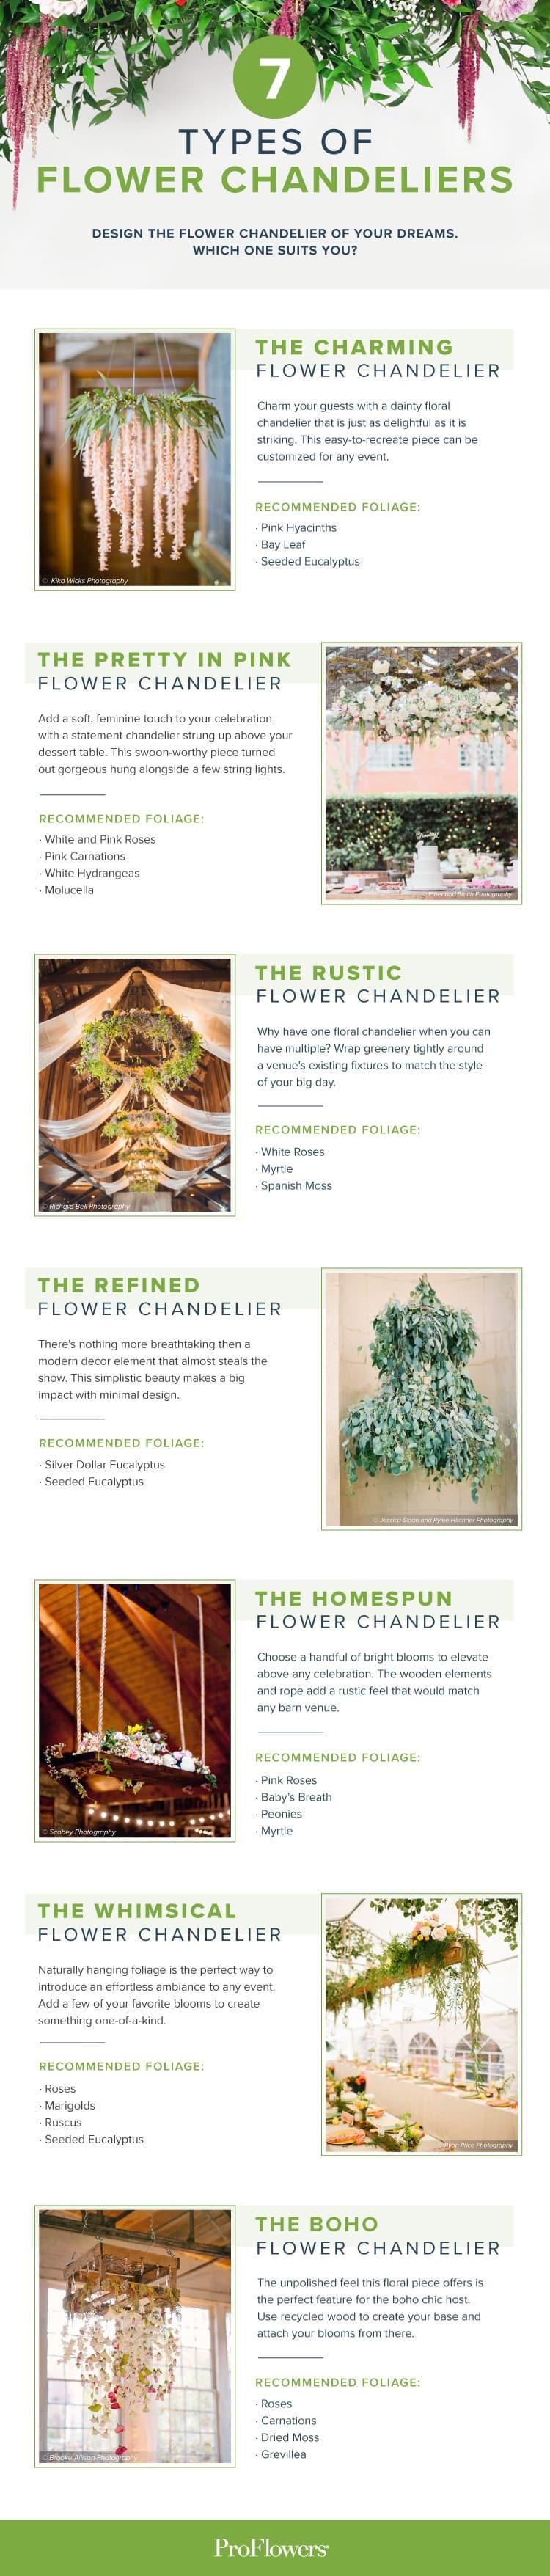 flower chandelier inspiration